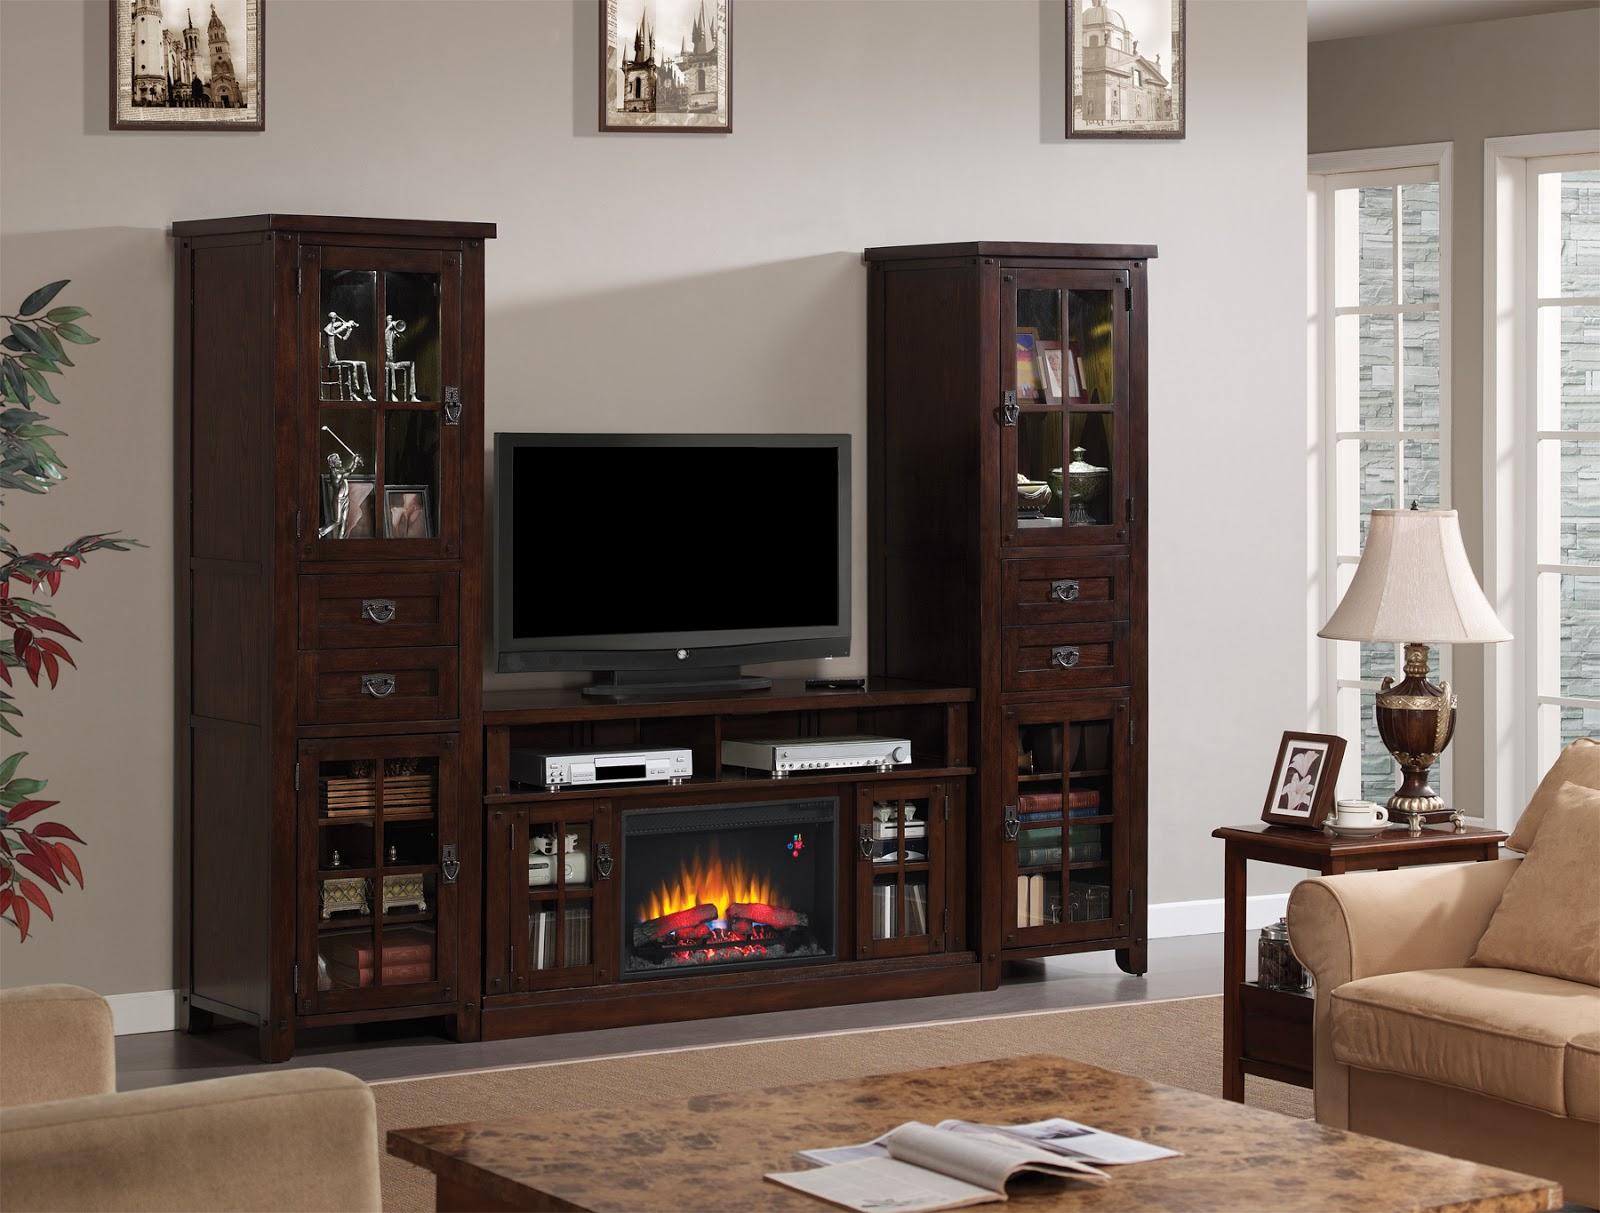 Twinstar International Zone Heating Featured Guest Post